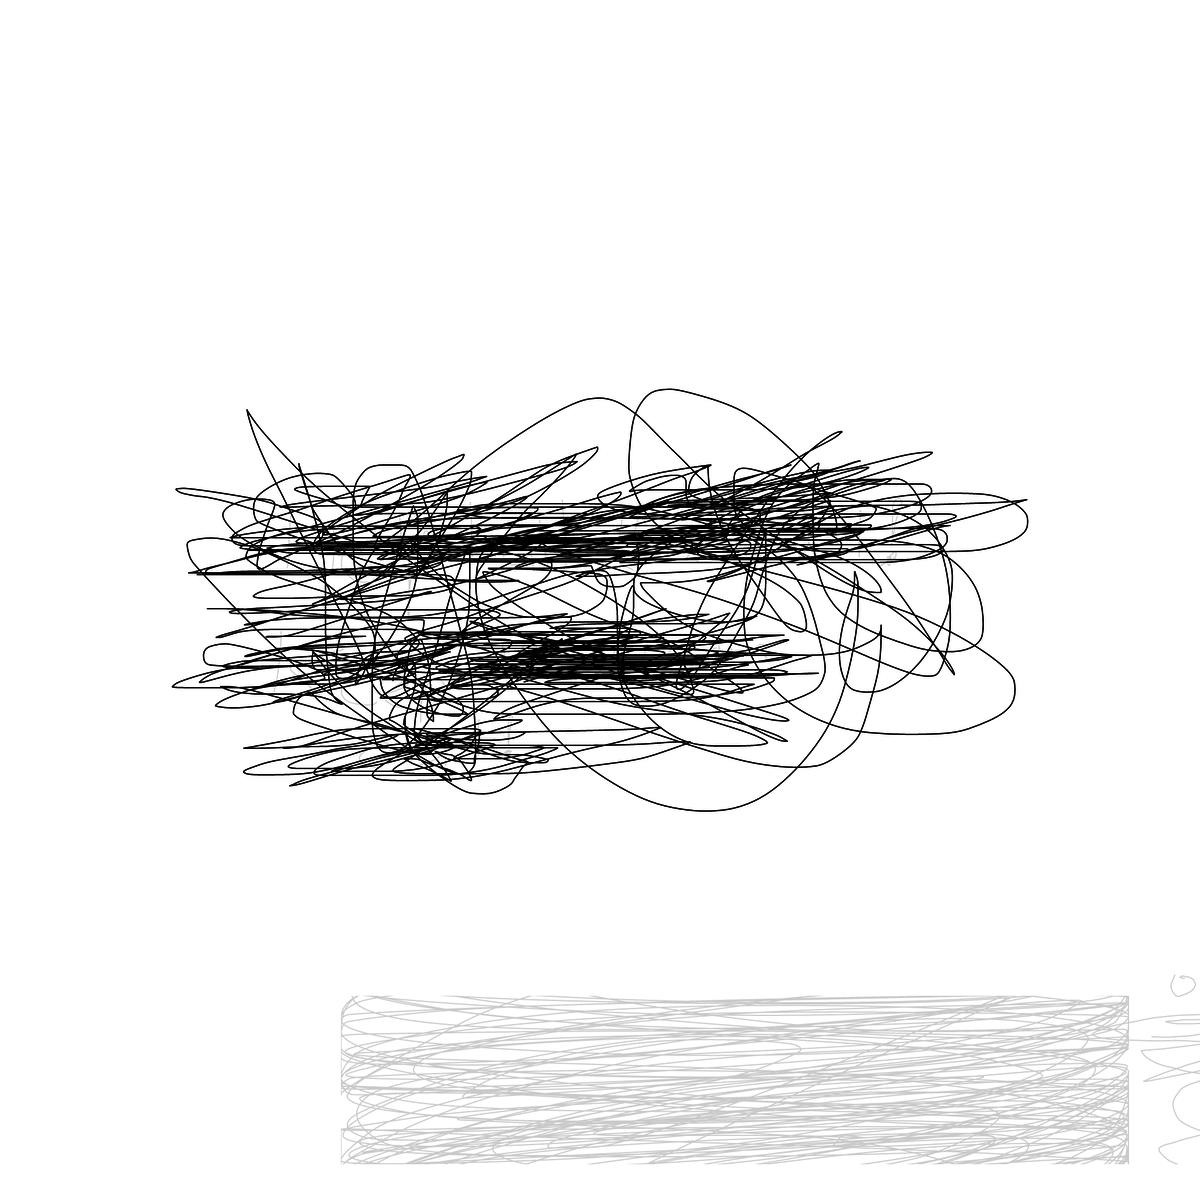 BAAAM drawing#17731 lat:32.5343856811523440lng: -117.1242446899414000